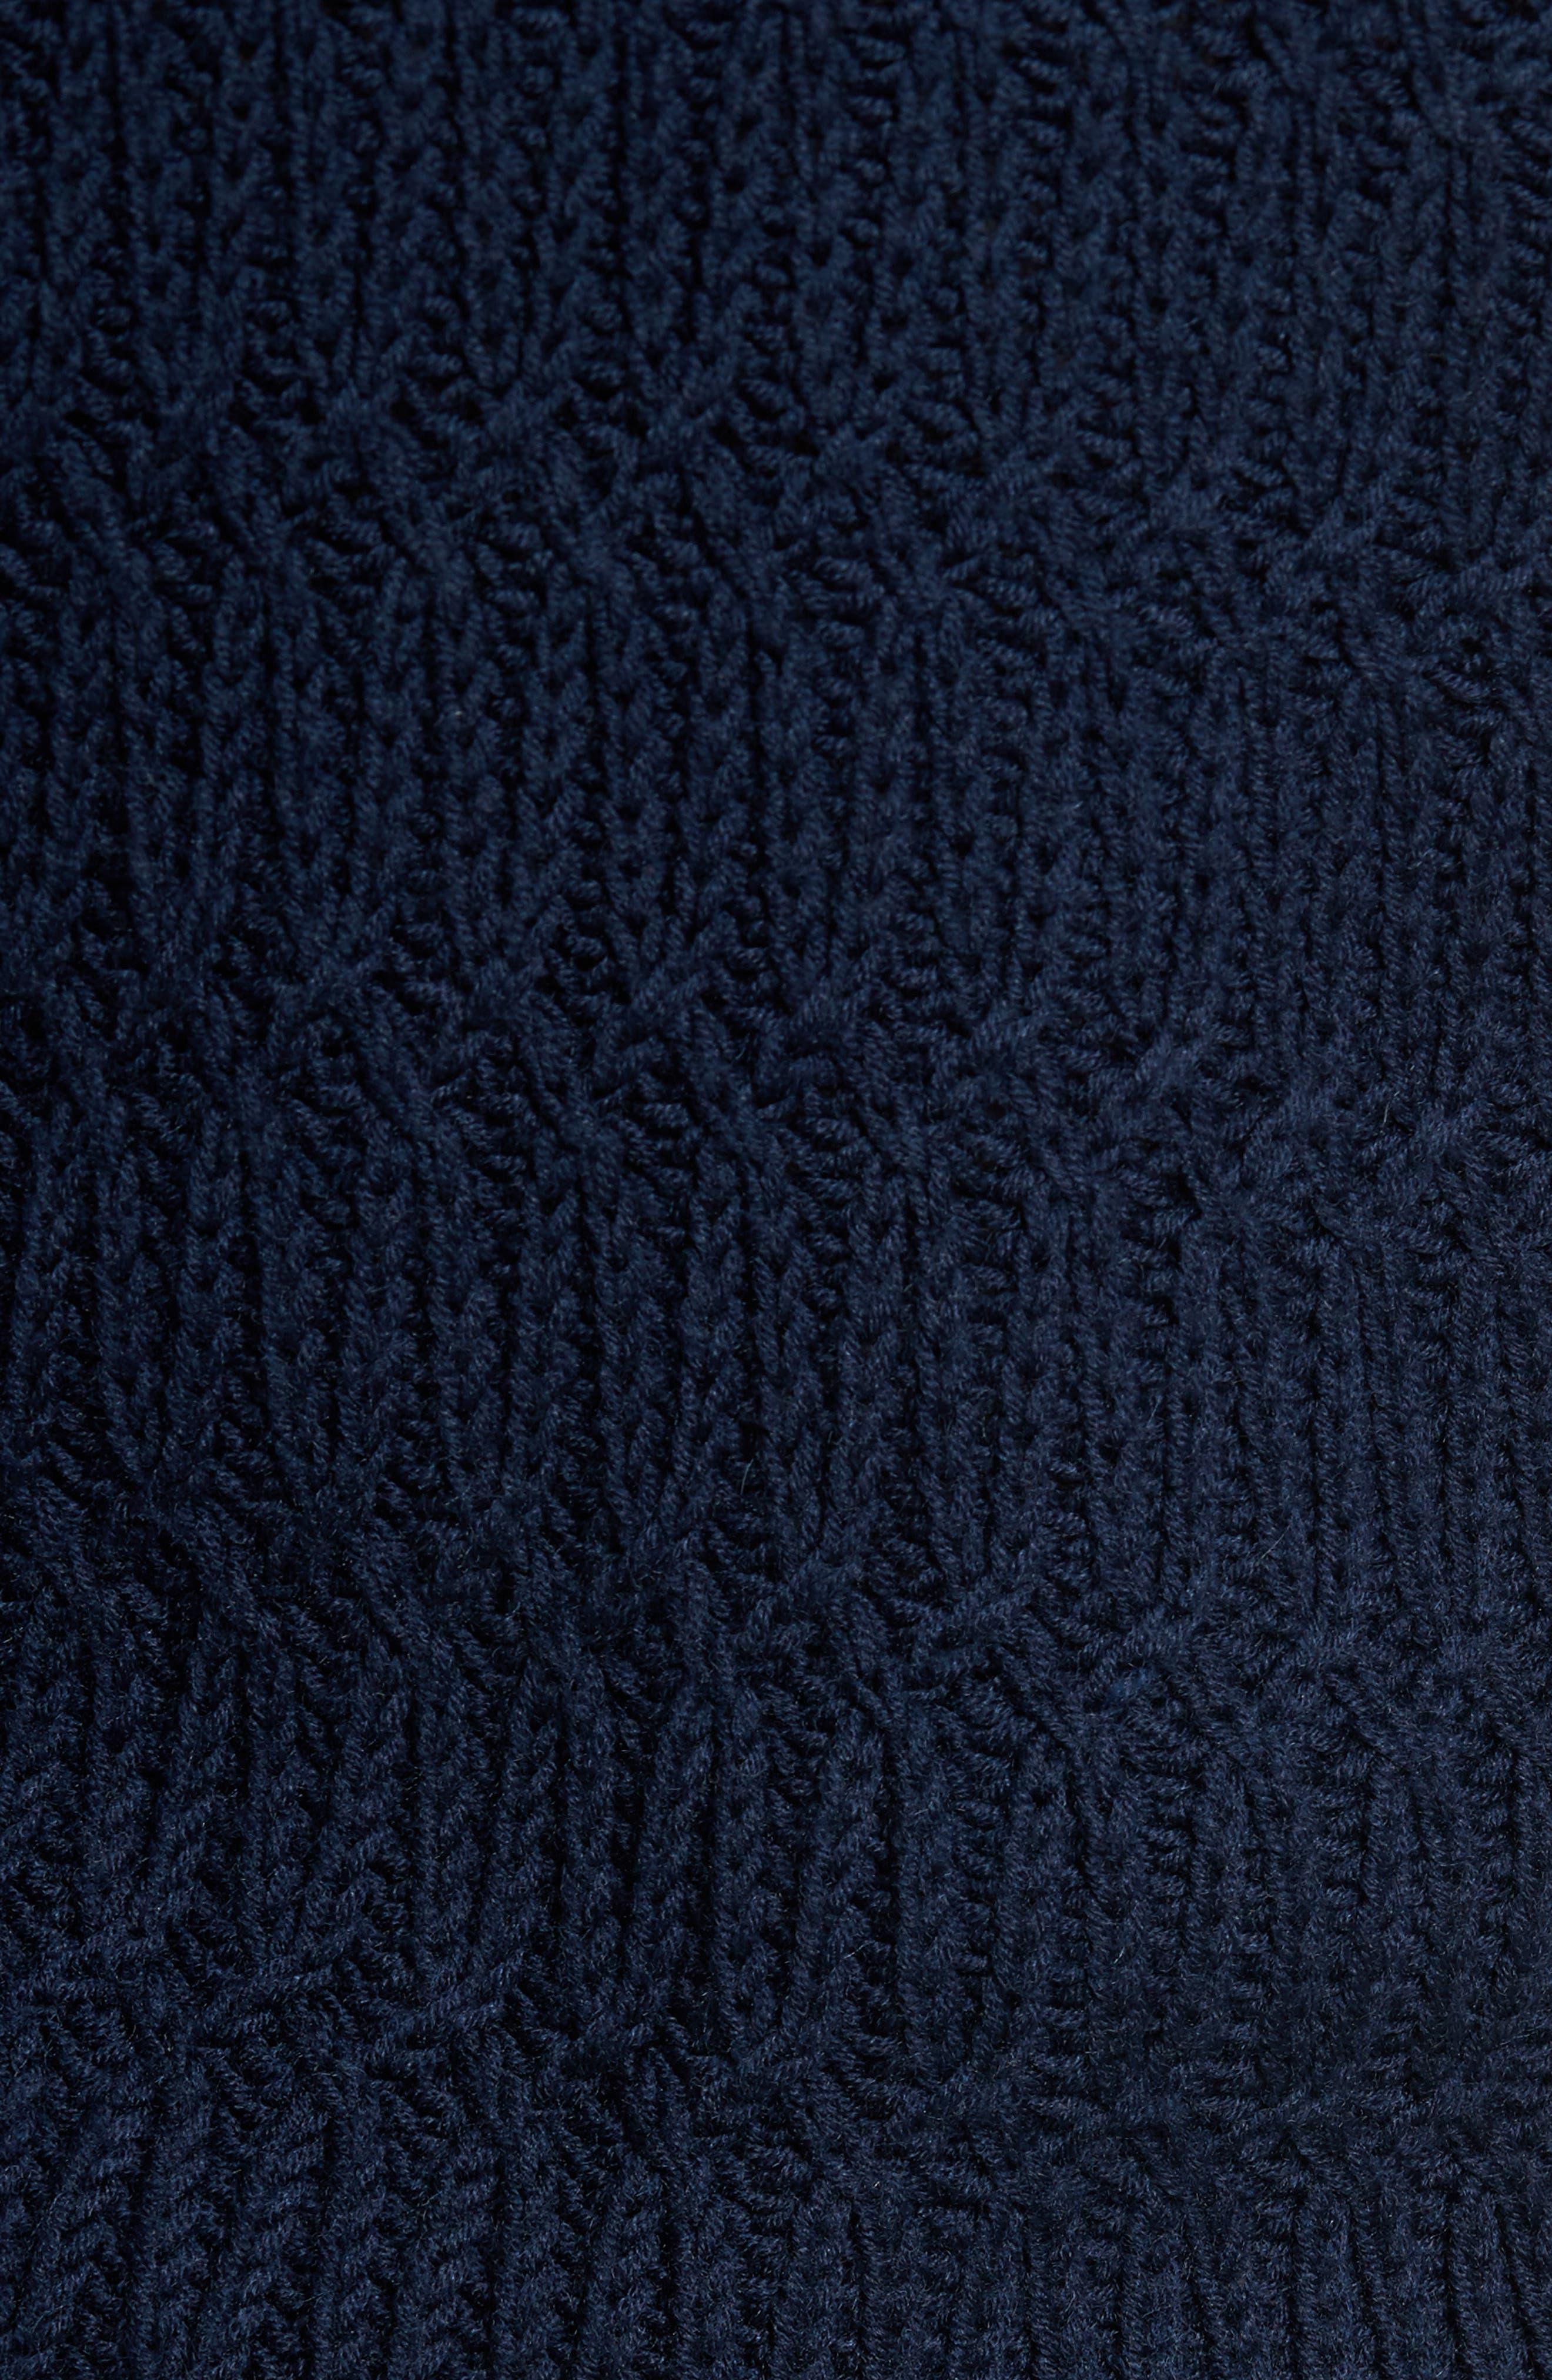 Chunky Turtleneck Sweater,                             Alternate thumbnail 5, color,